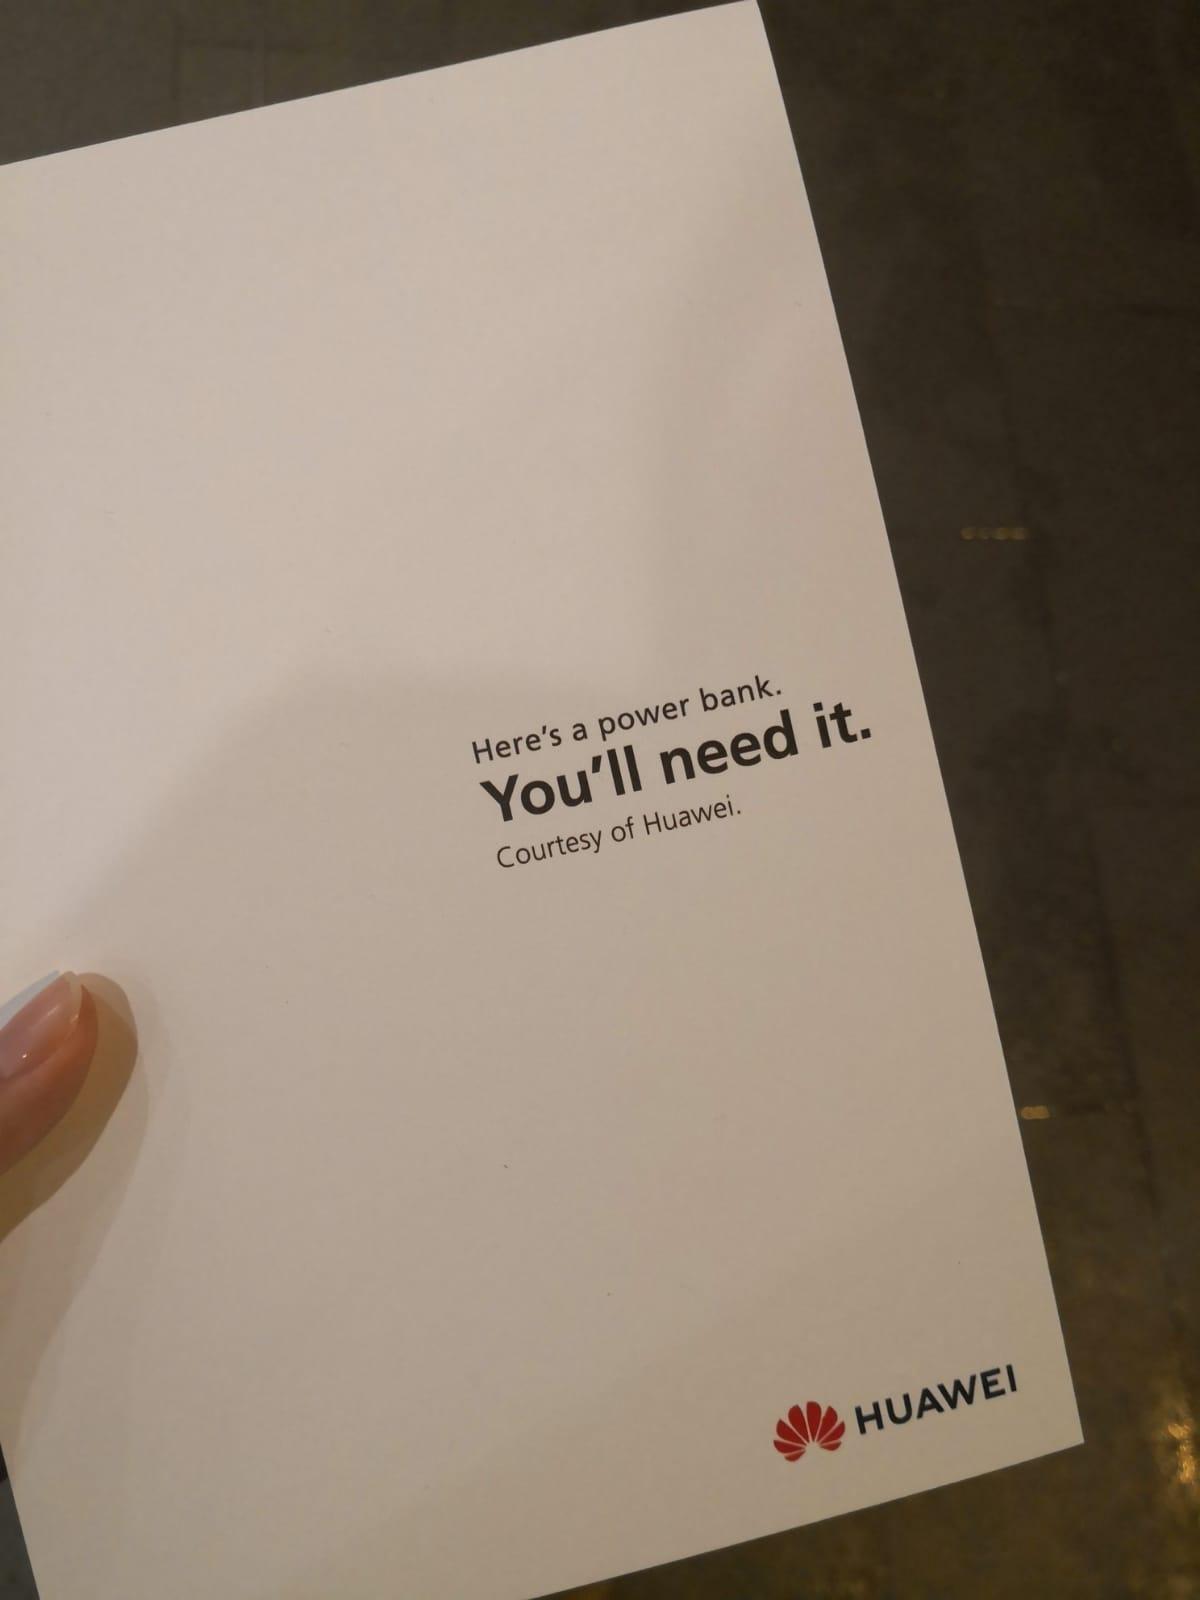 Papel que foi entregue junto aos carregadores portáteis da Huawei